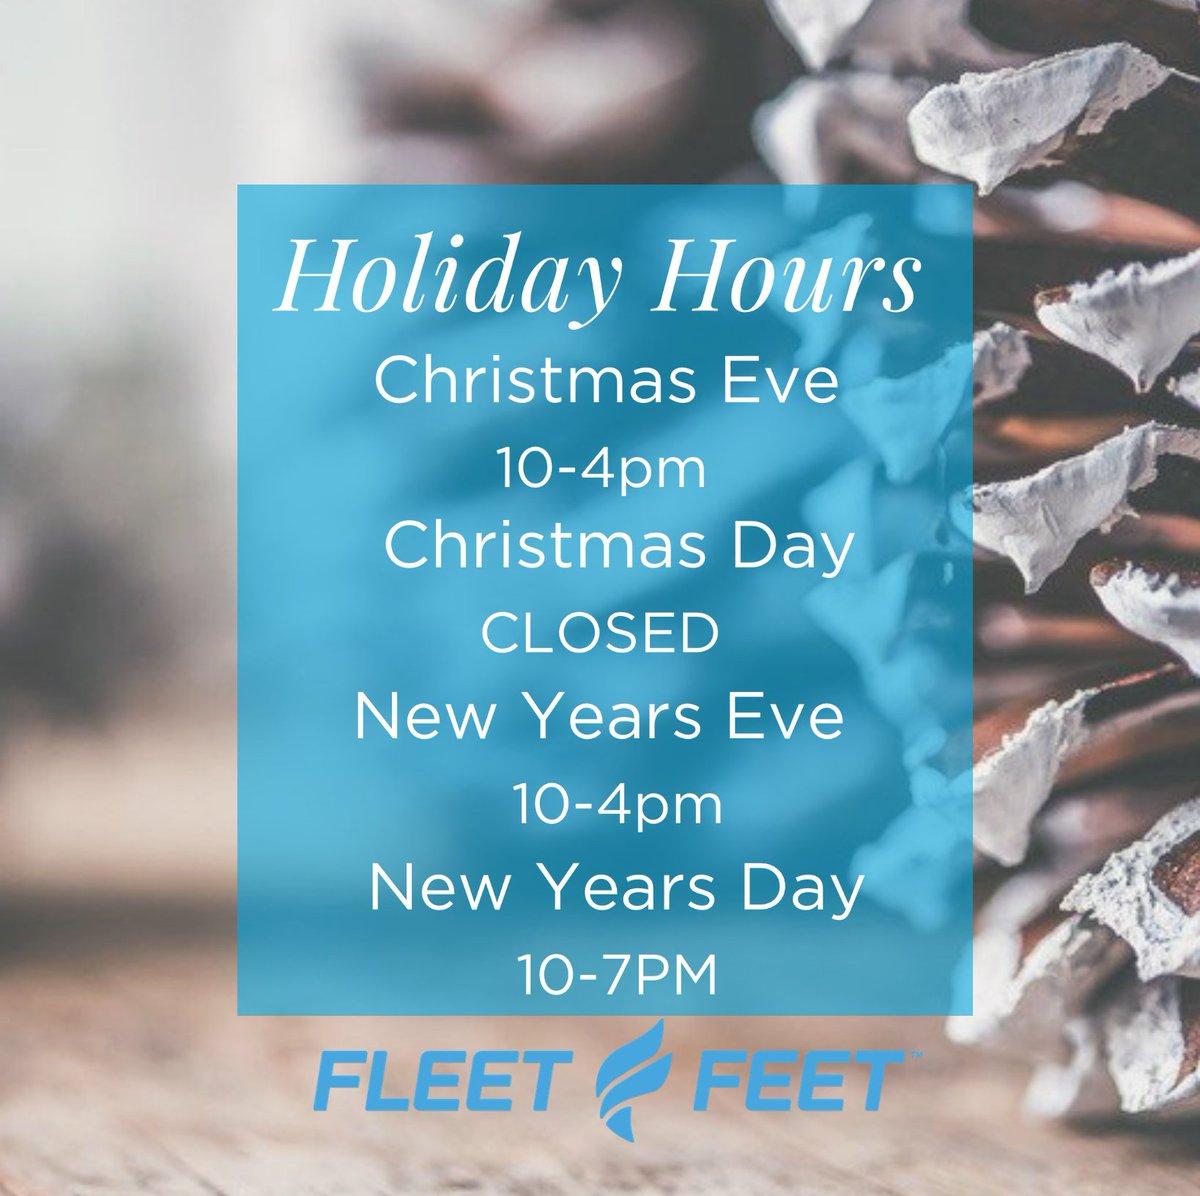 f744a9a3cc Fleet Feet Wichita on Twitter: